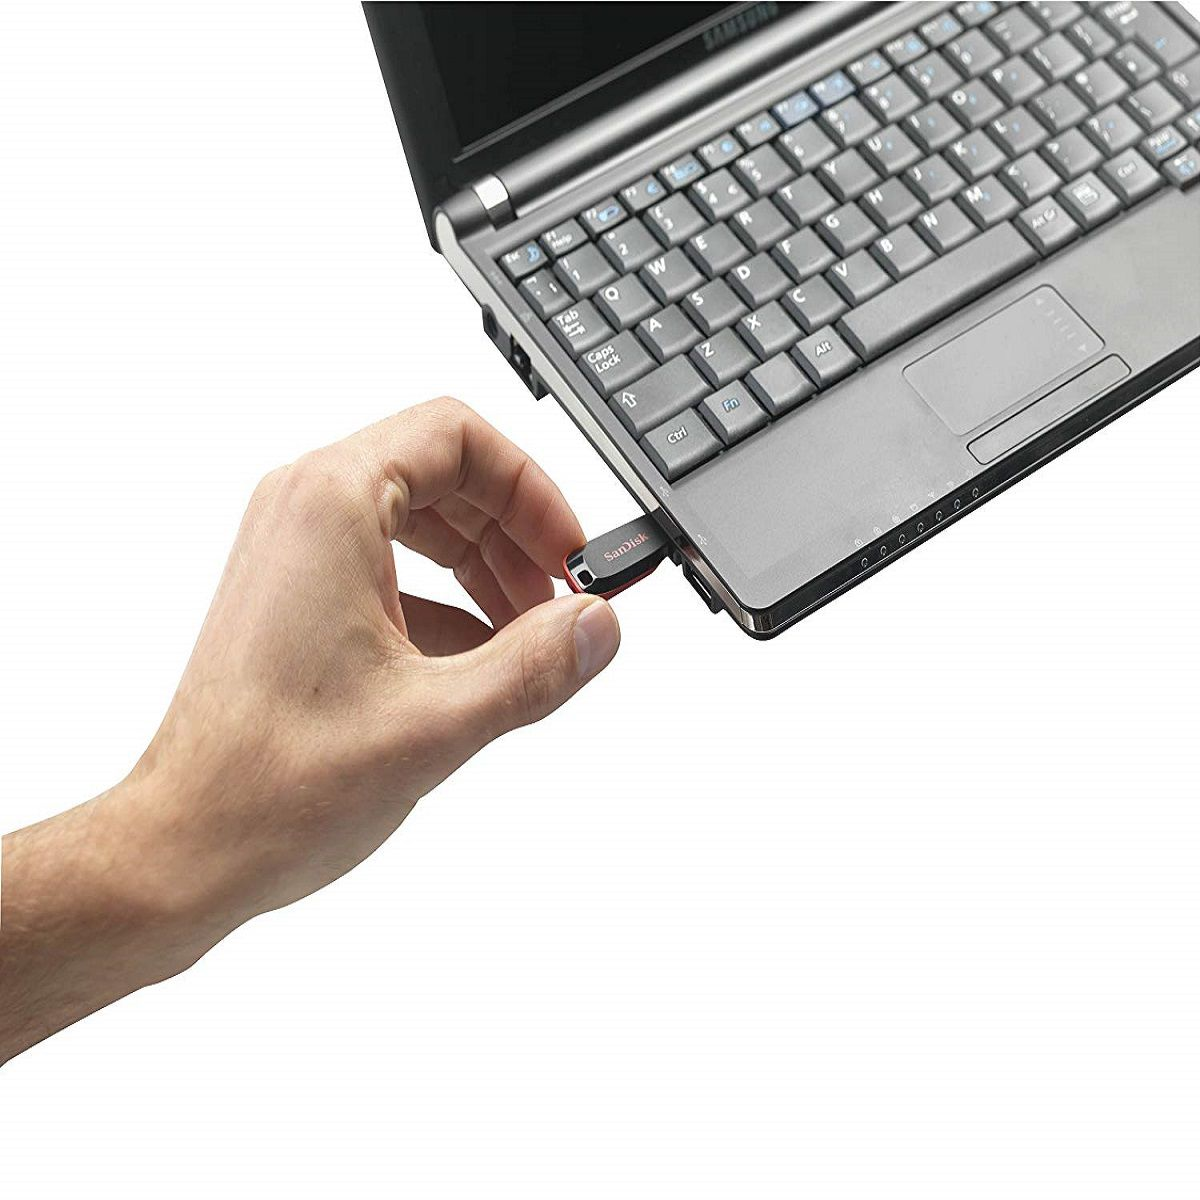 Pen Drive 64GB - Sandisk - Cruzer Blade  - ShopNoroeste.com.br